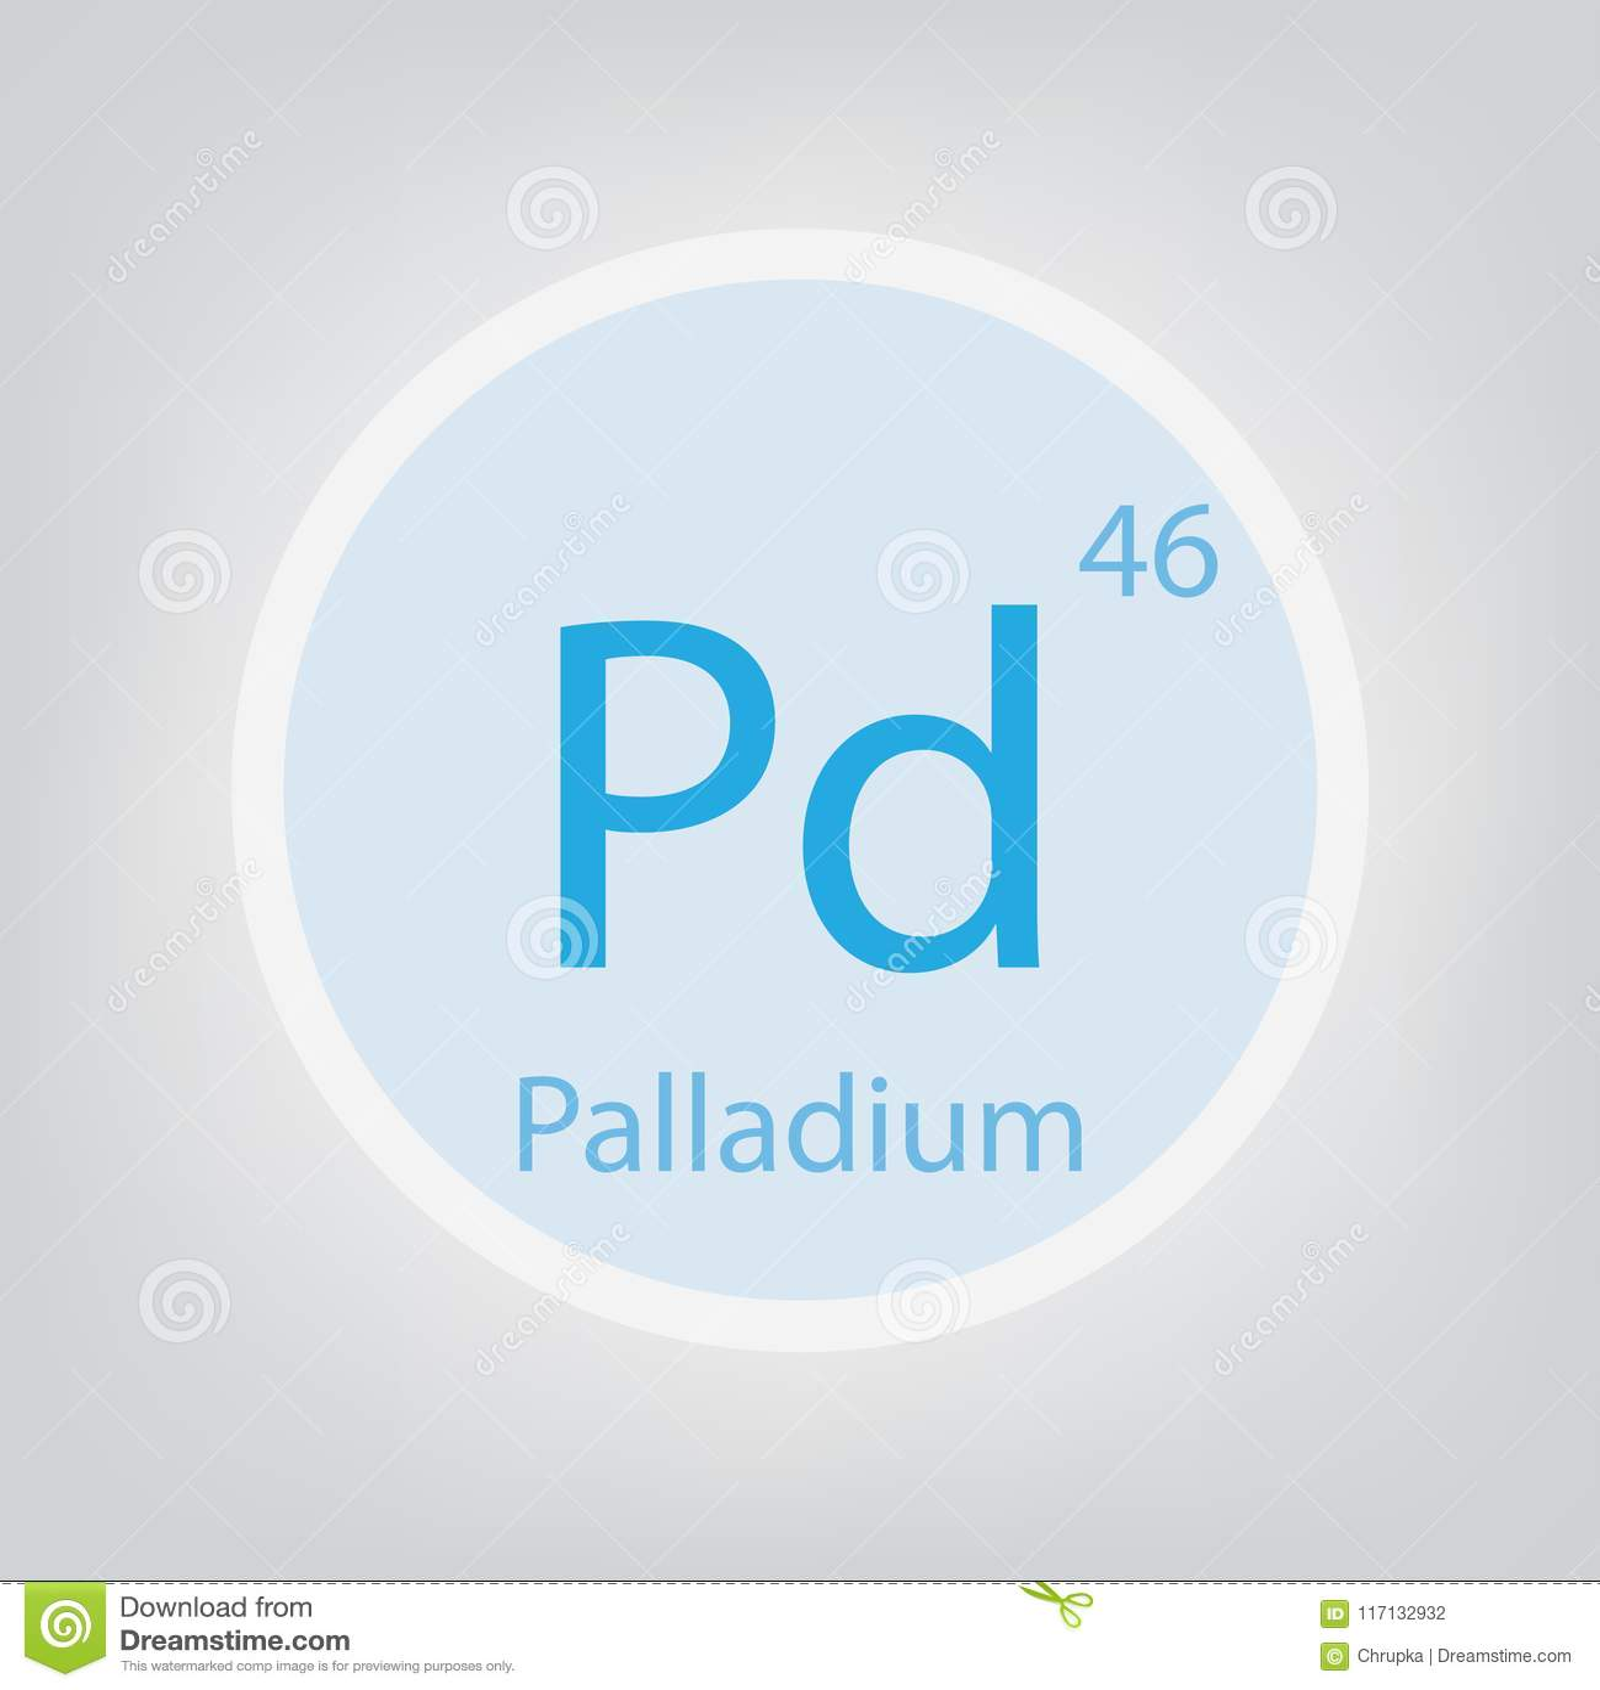 Palladium Pd Chemical Element Icon Stock Vector Illustration Of